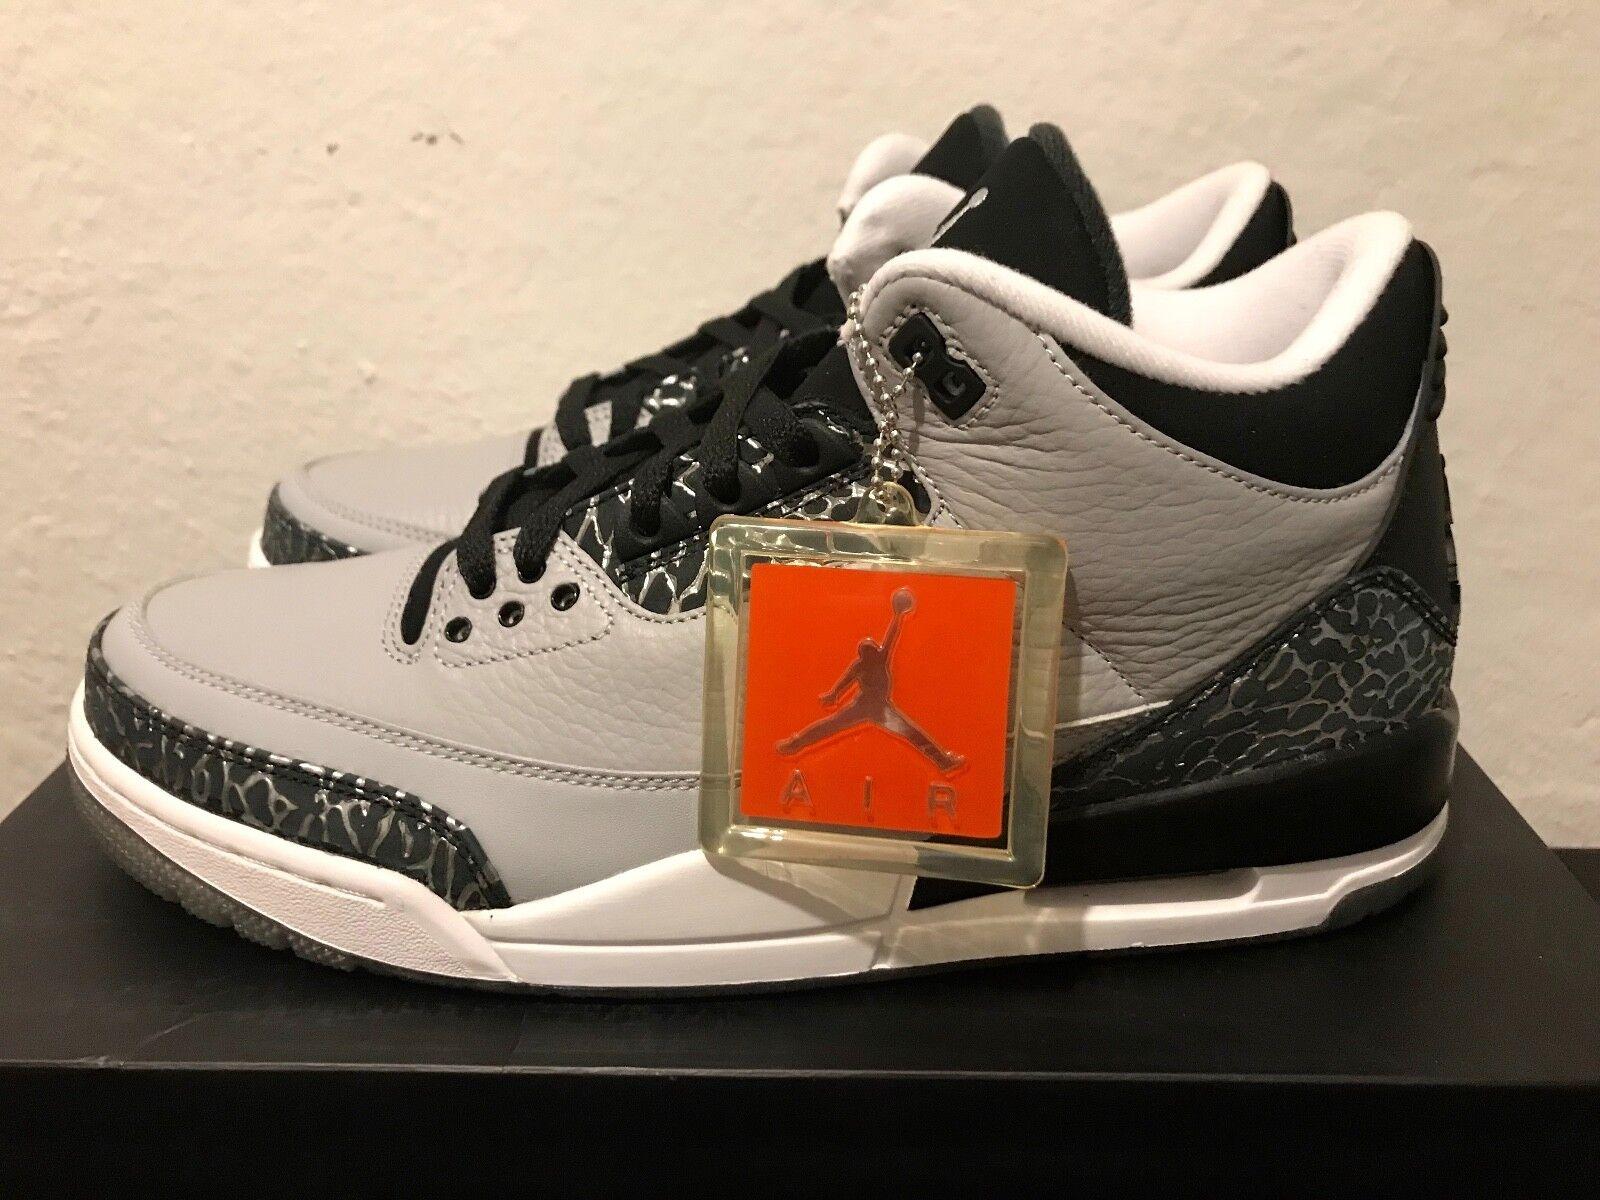 Nike Air Jordan 3 Retro  Wolf Grey  US 10.5 44,5 Max 1 supreme yeezy Sneaker